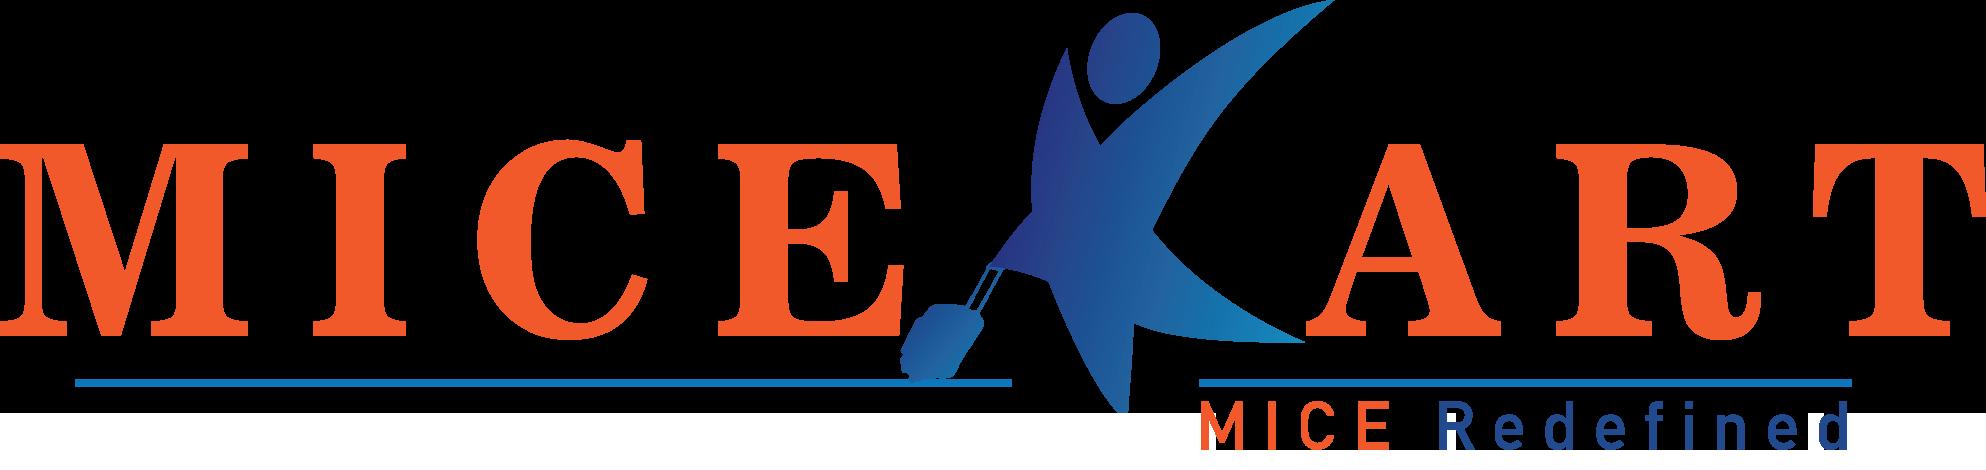 MICEkart.com -Blog - MICE Redifined